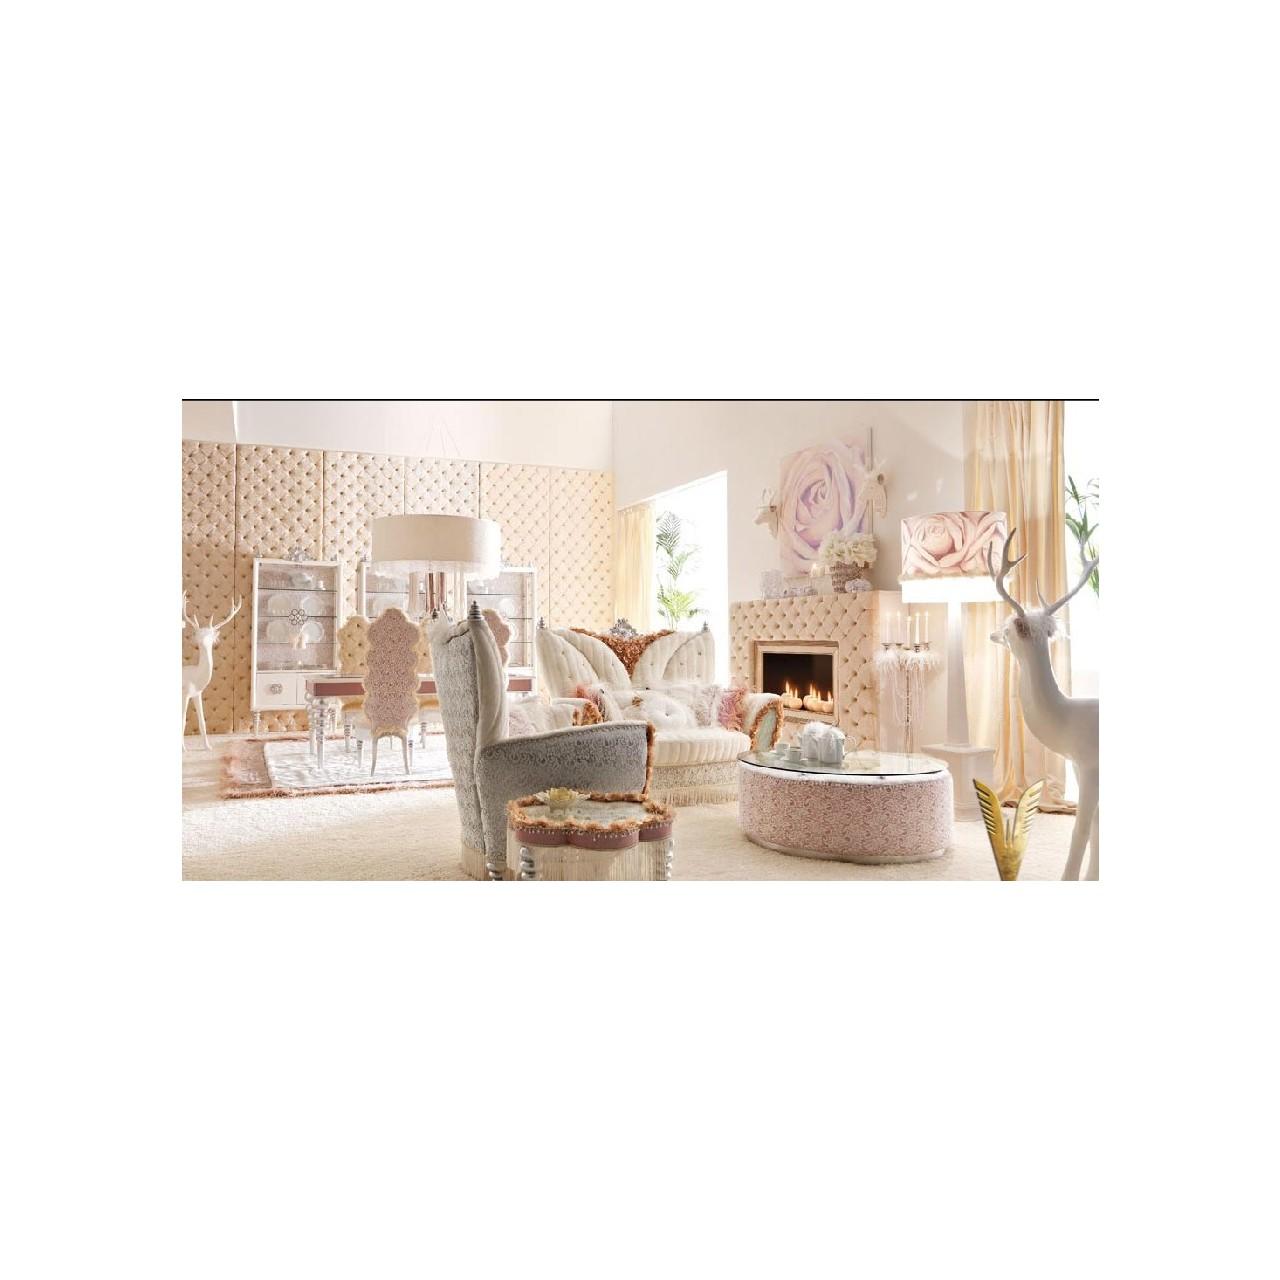 Chic Decorative Fireplace CG32